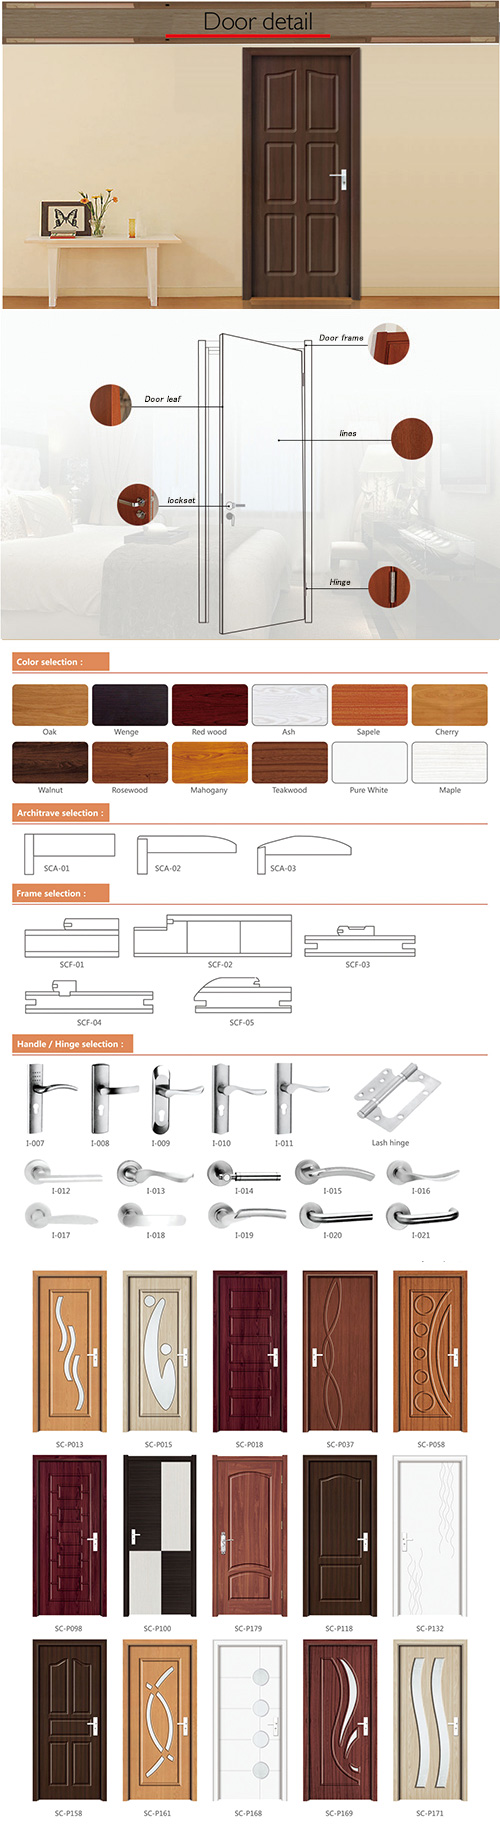 2016 New Design Turkish MDF Doors with PVC Coated